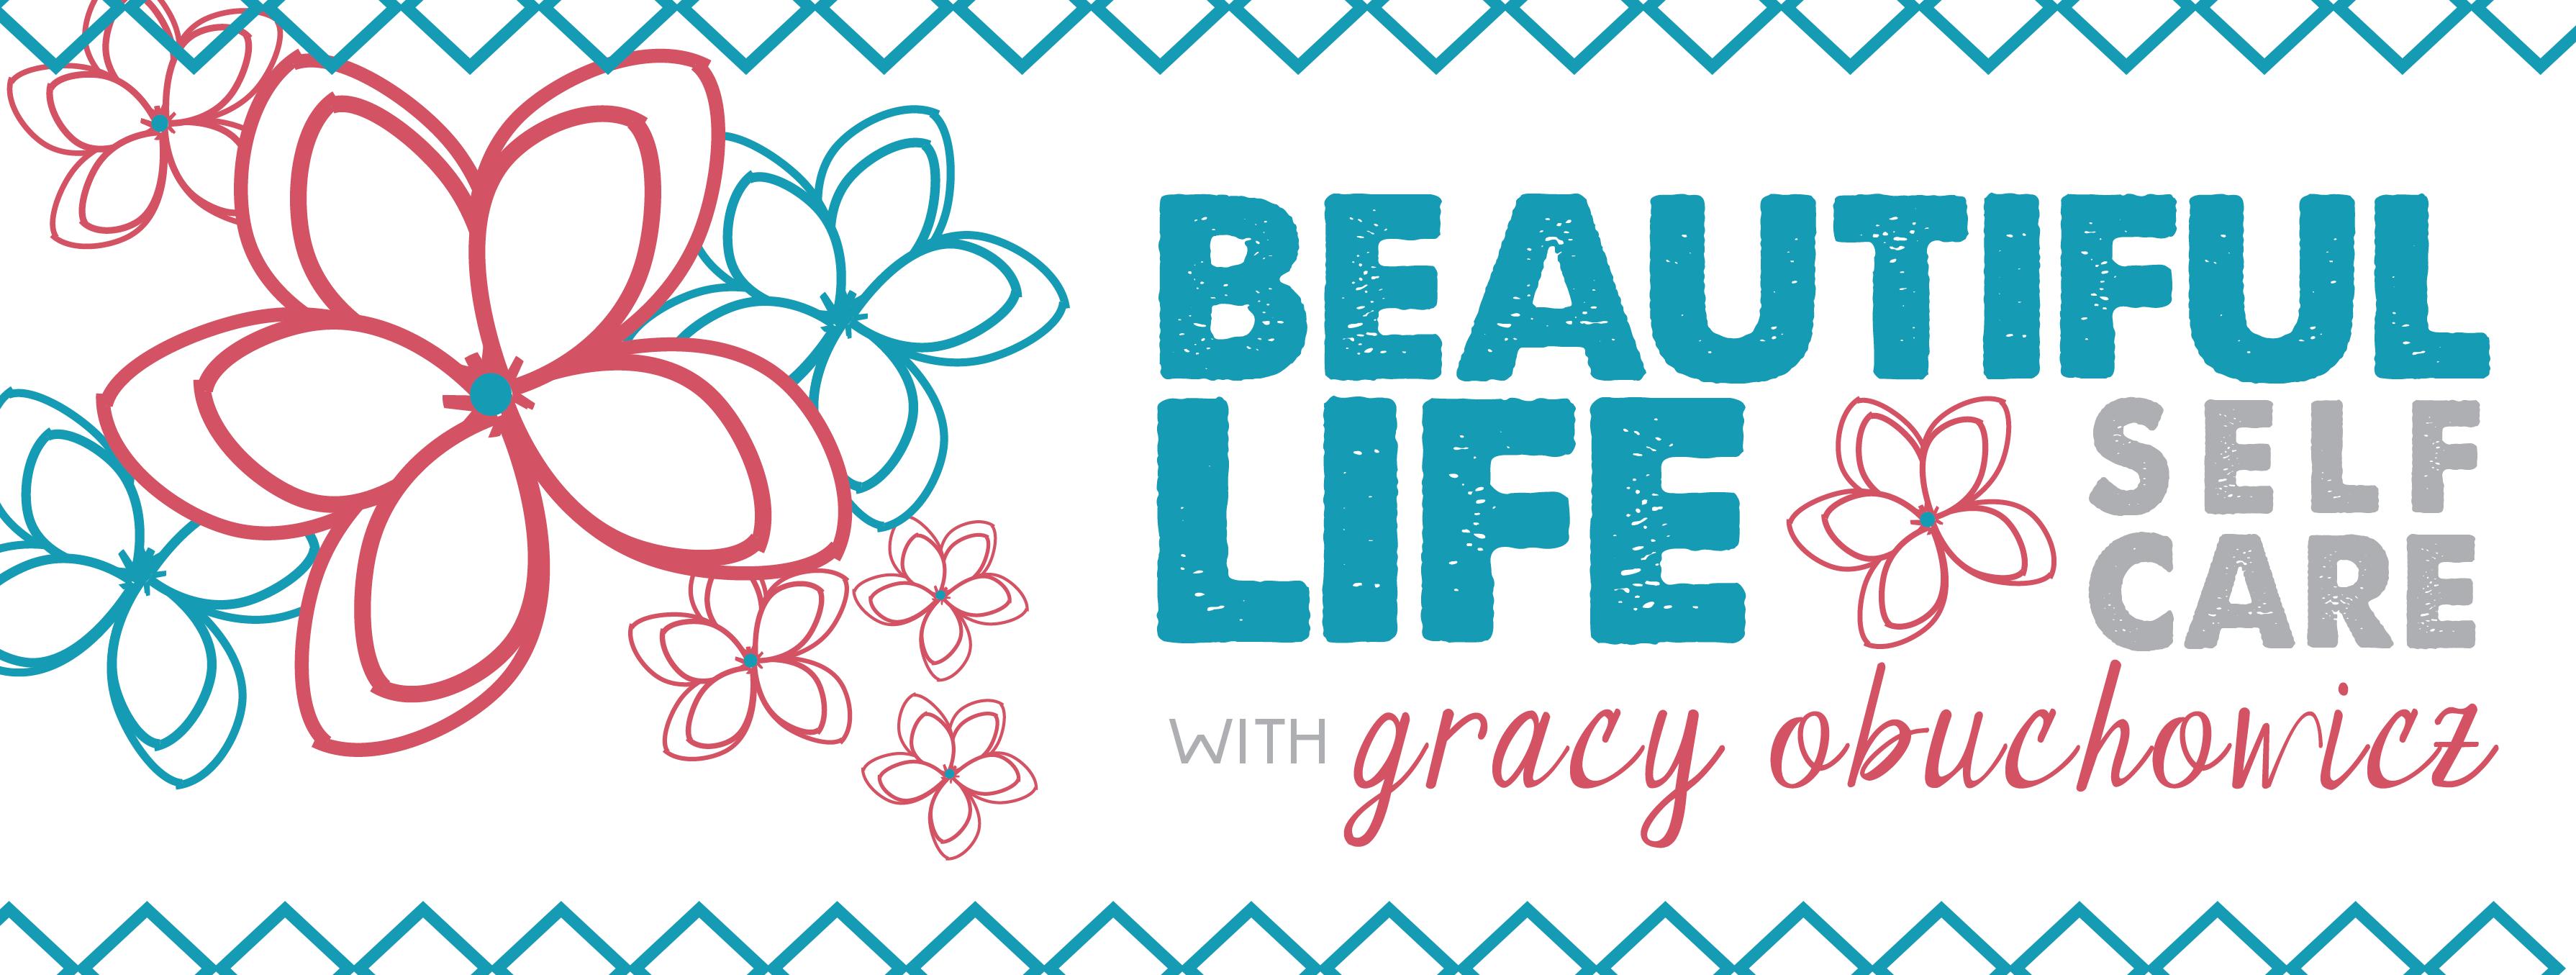 Beautiful Life Self Care